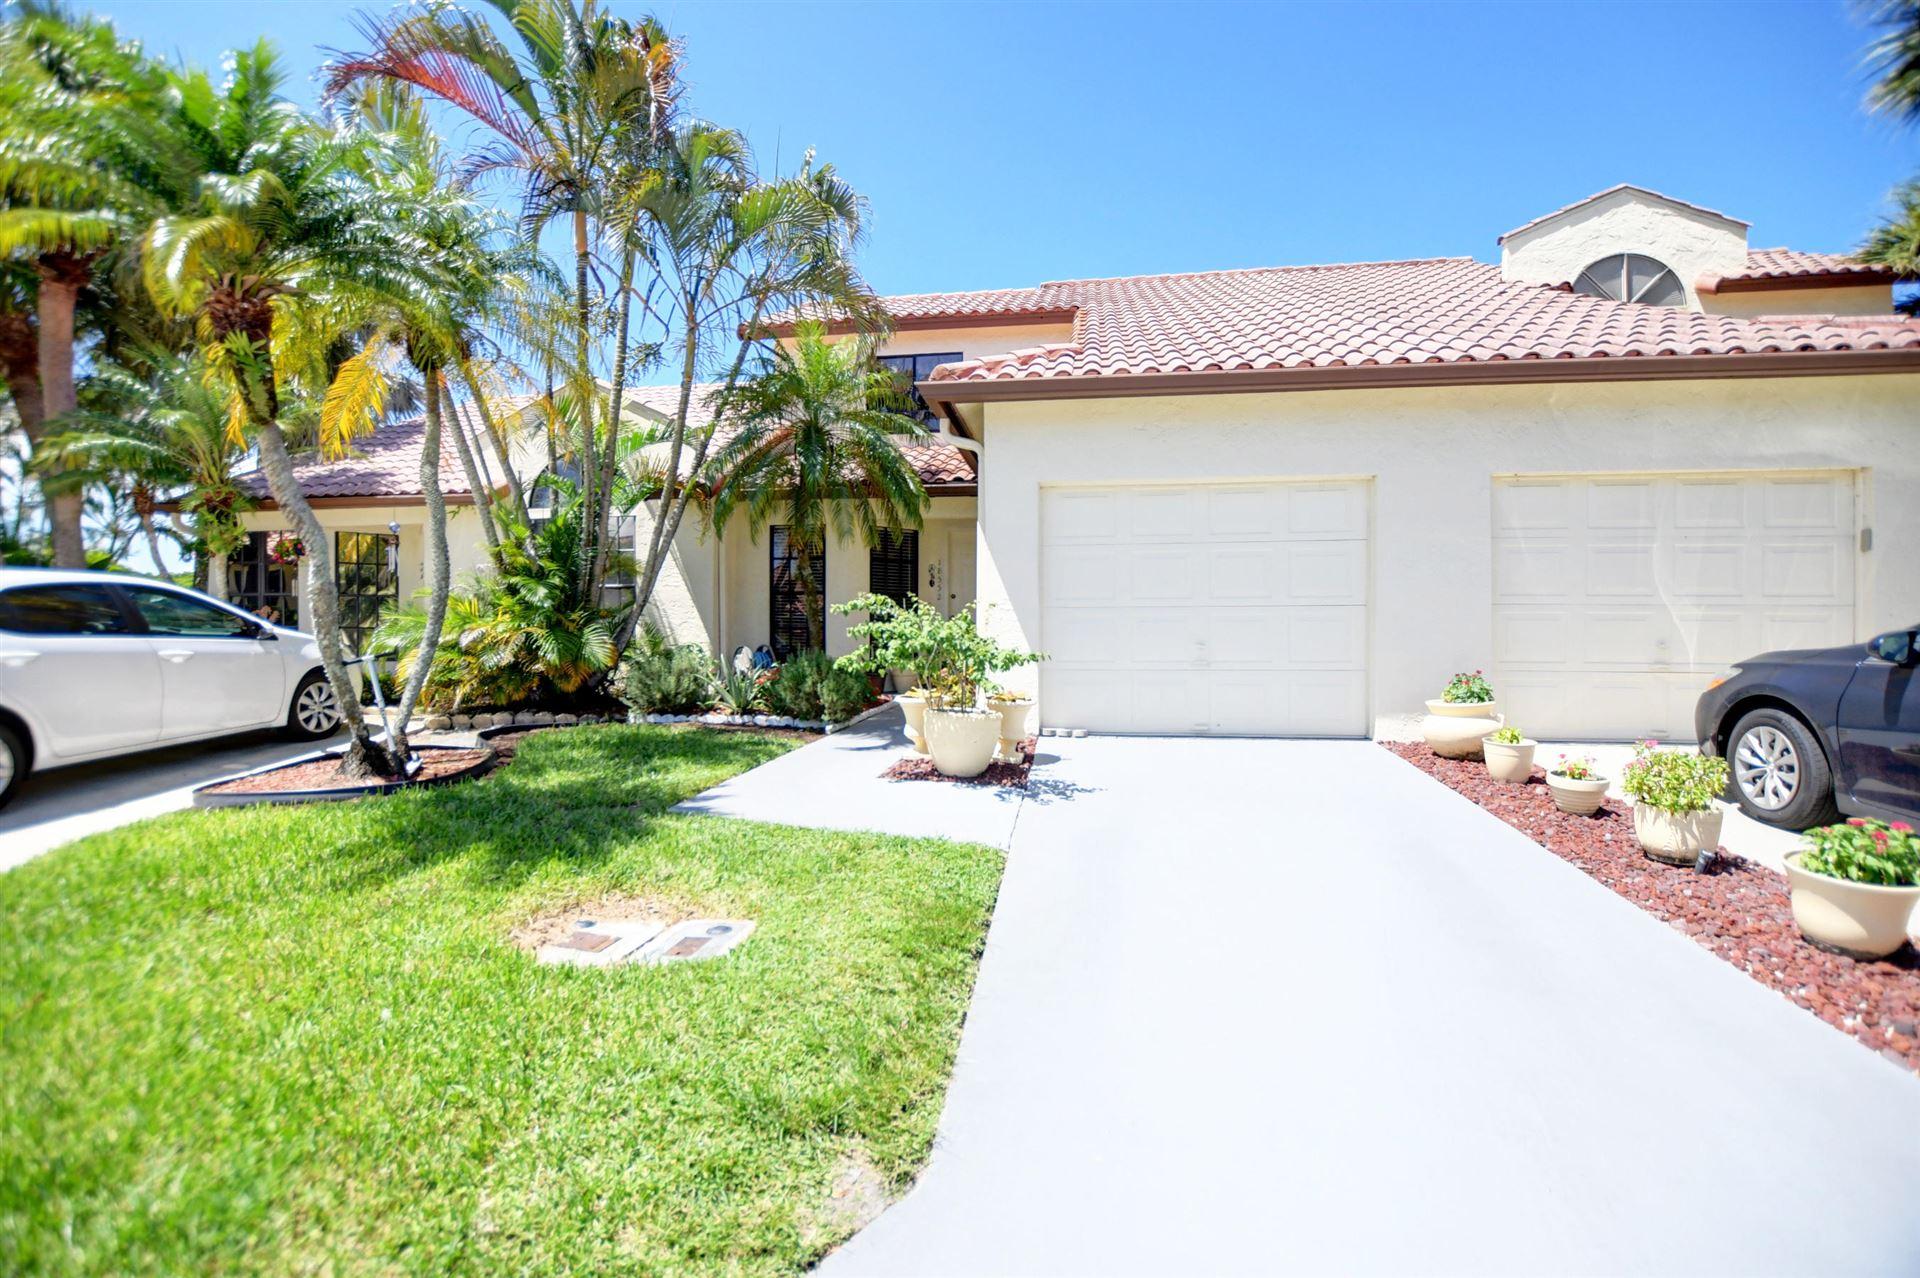 18552 Woodstream Drive, Boca Raton, FL 33498 - #: RX-10732855